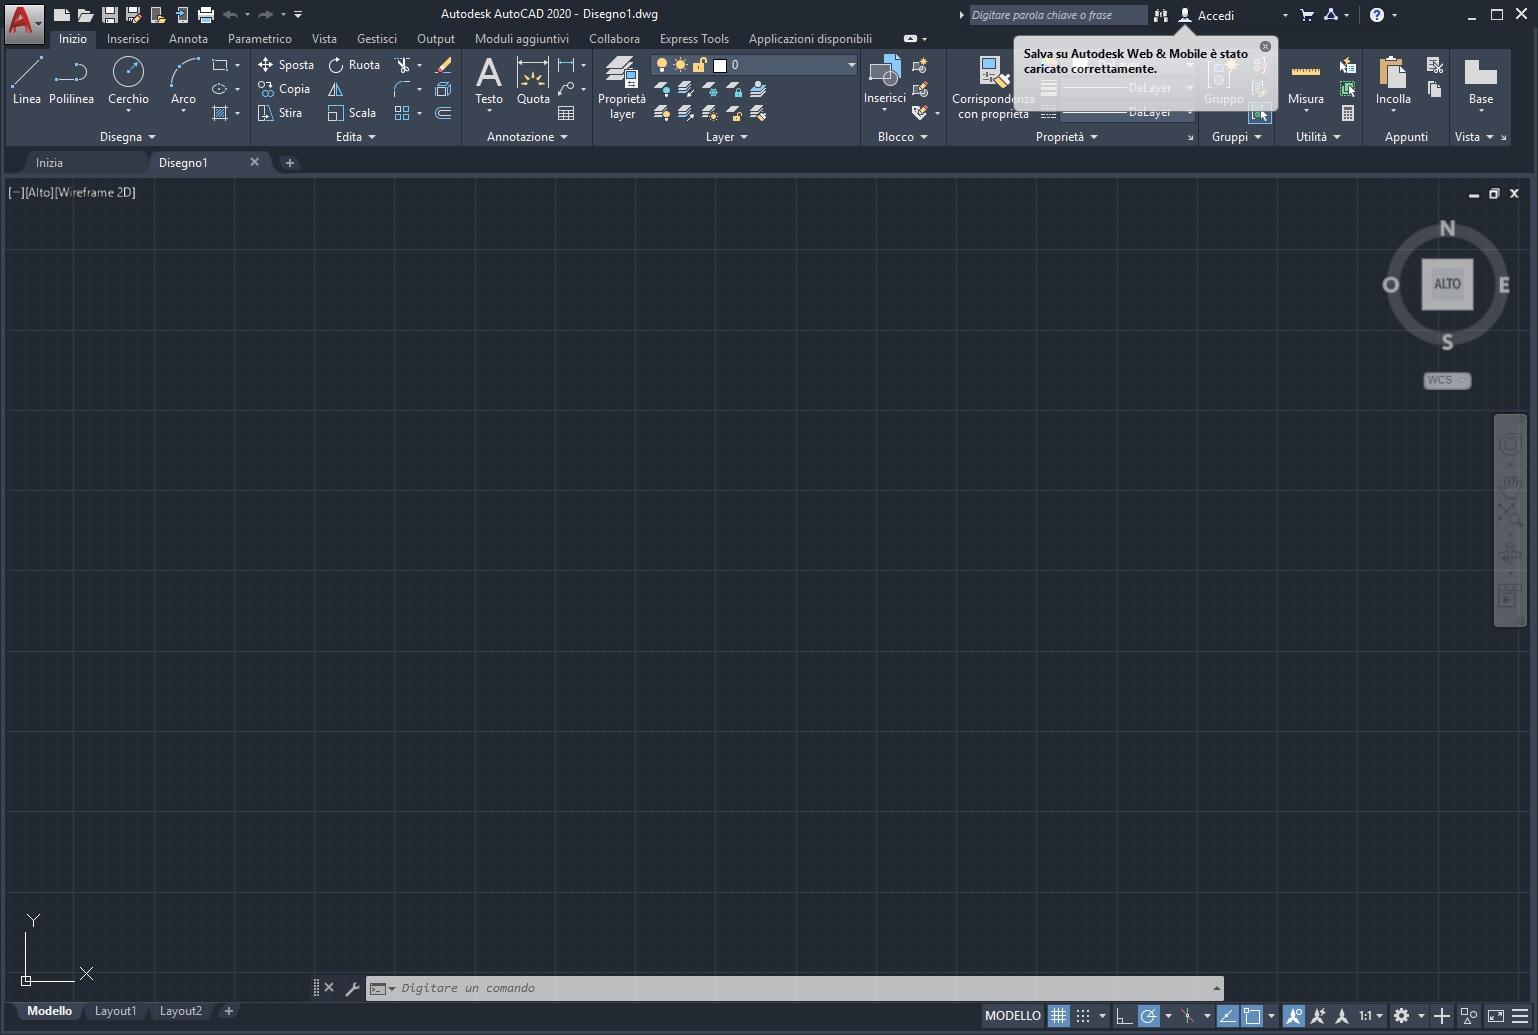 Autodesk AUTOCAD 2021 x64 - ITA